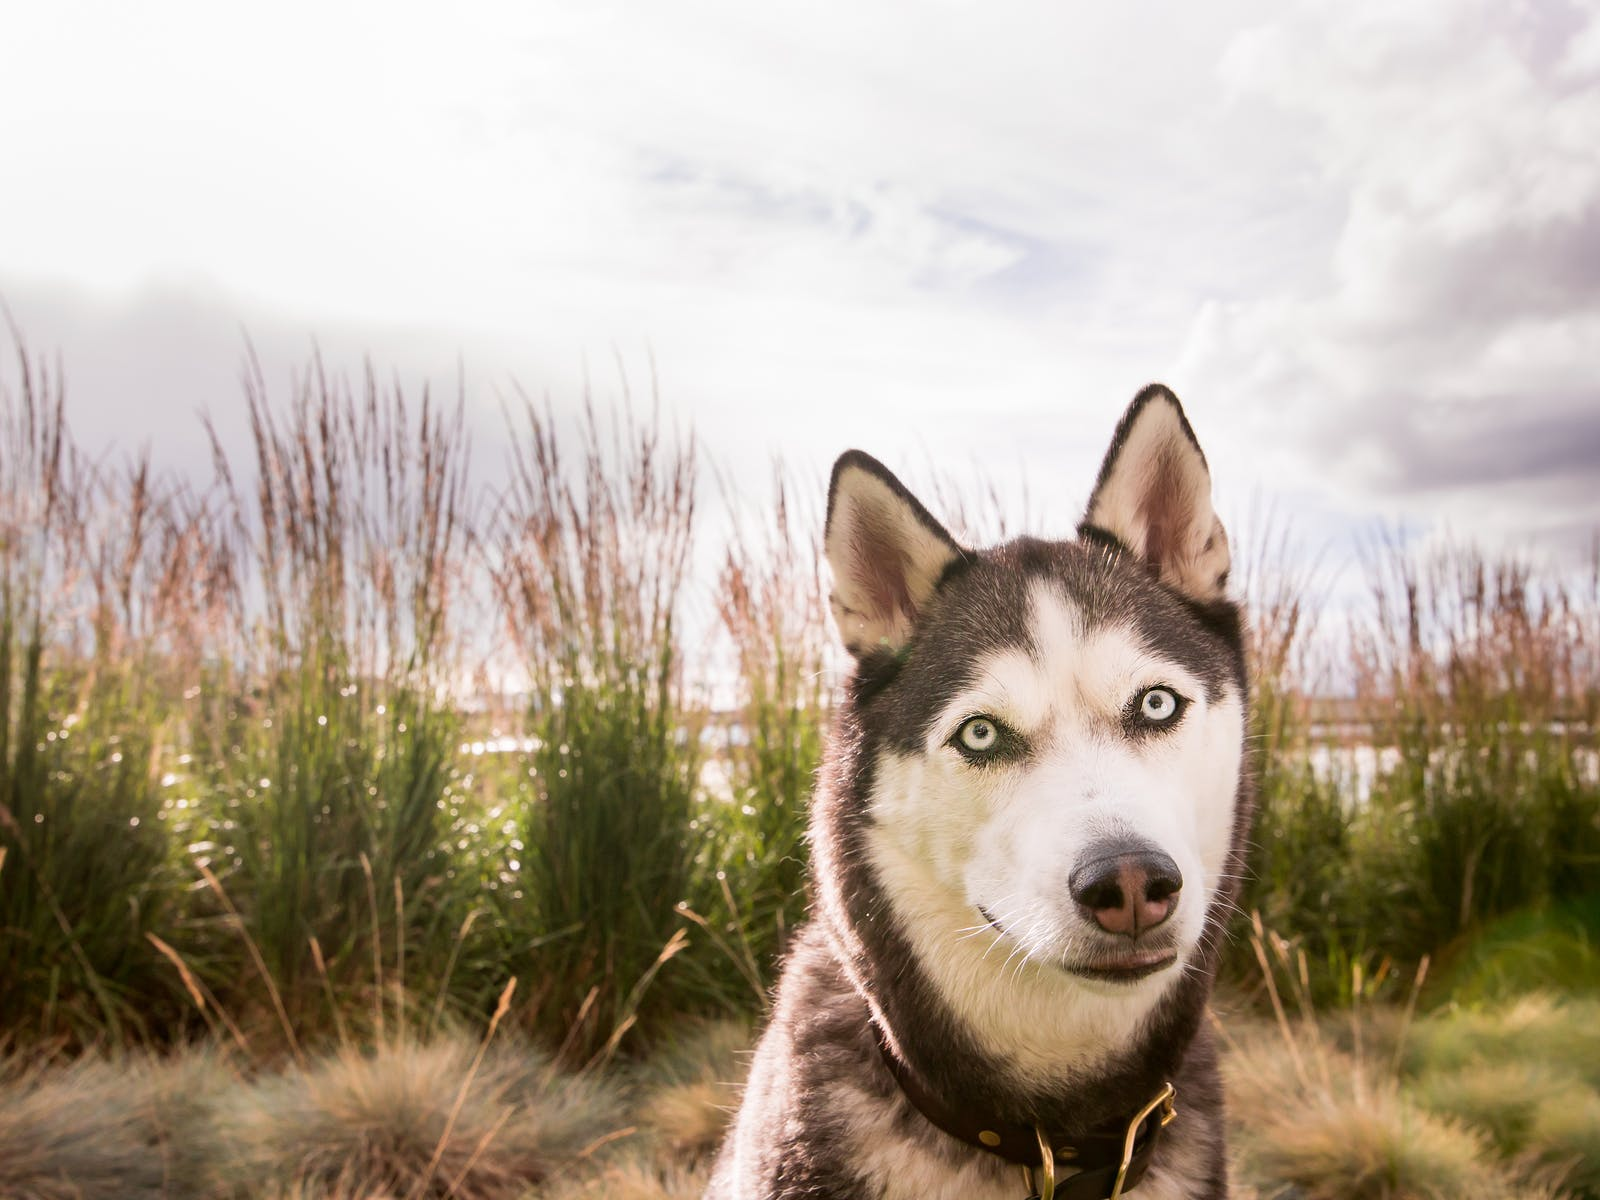 Siberian husky standing in front of beach grasses